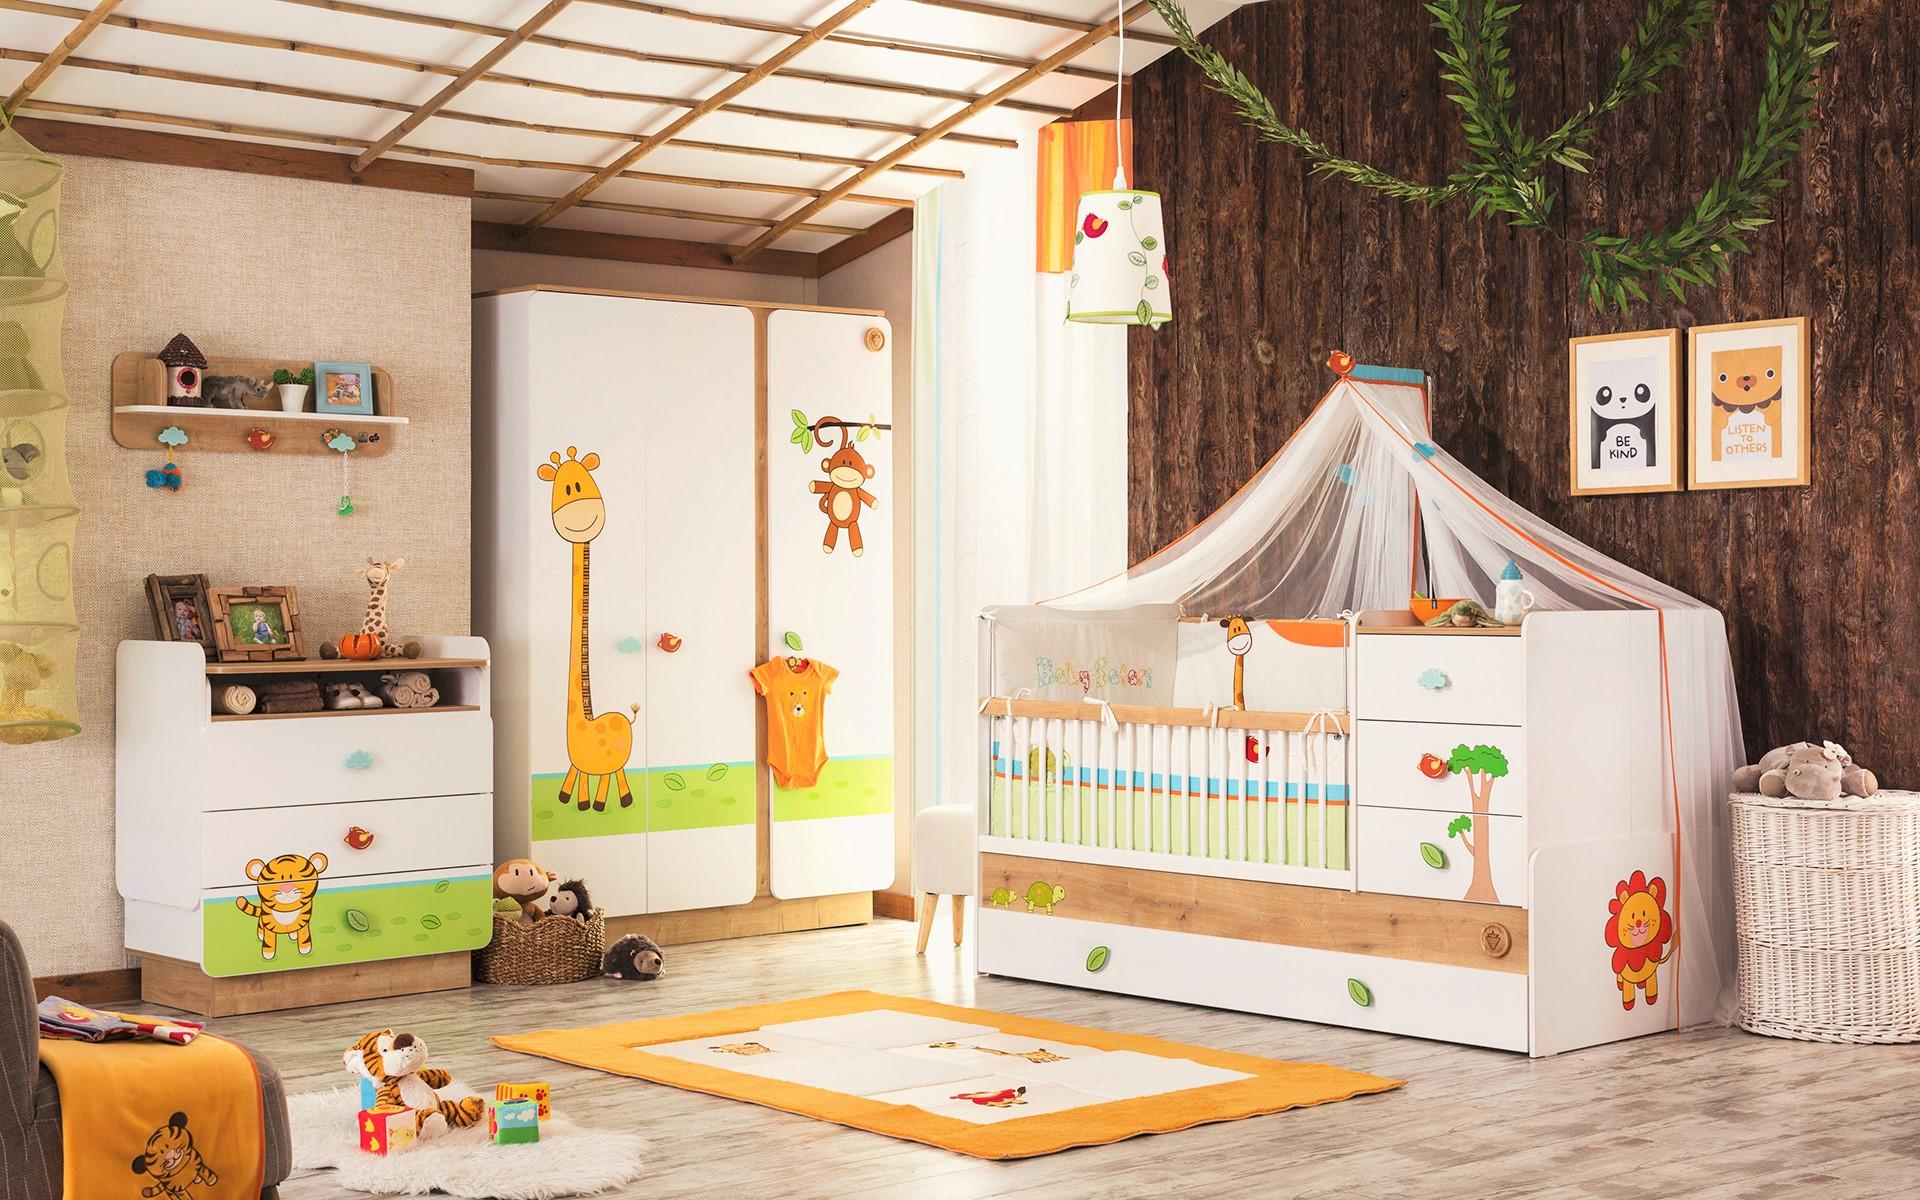 Babykamer Compleet - Babykamer Specialist in kinderkamers en ...